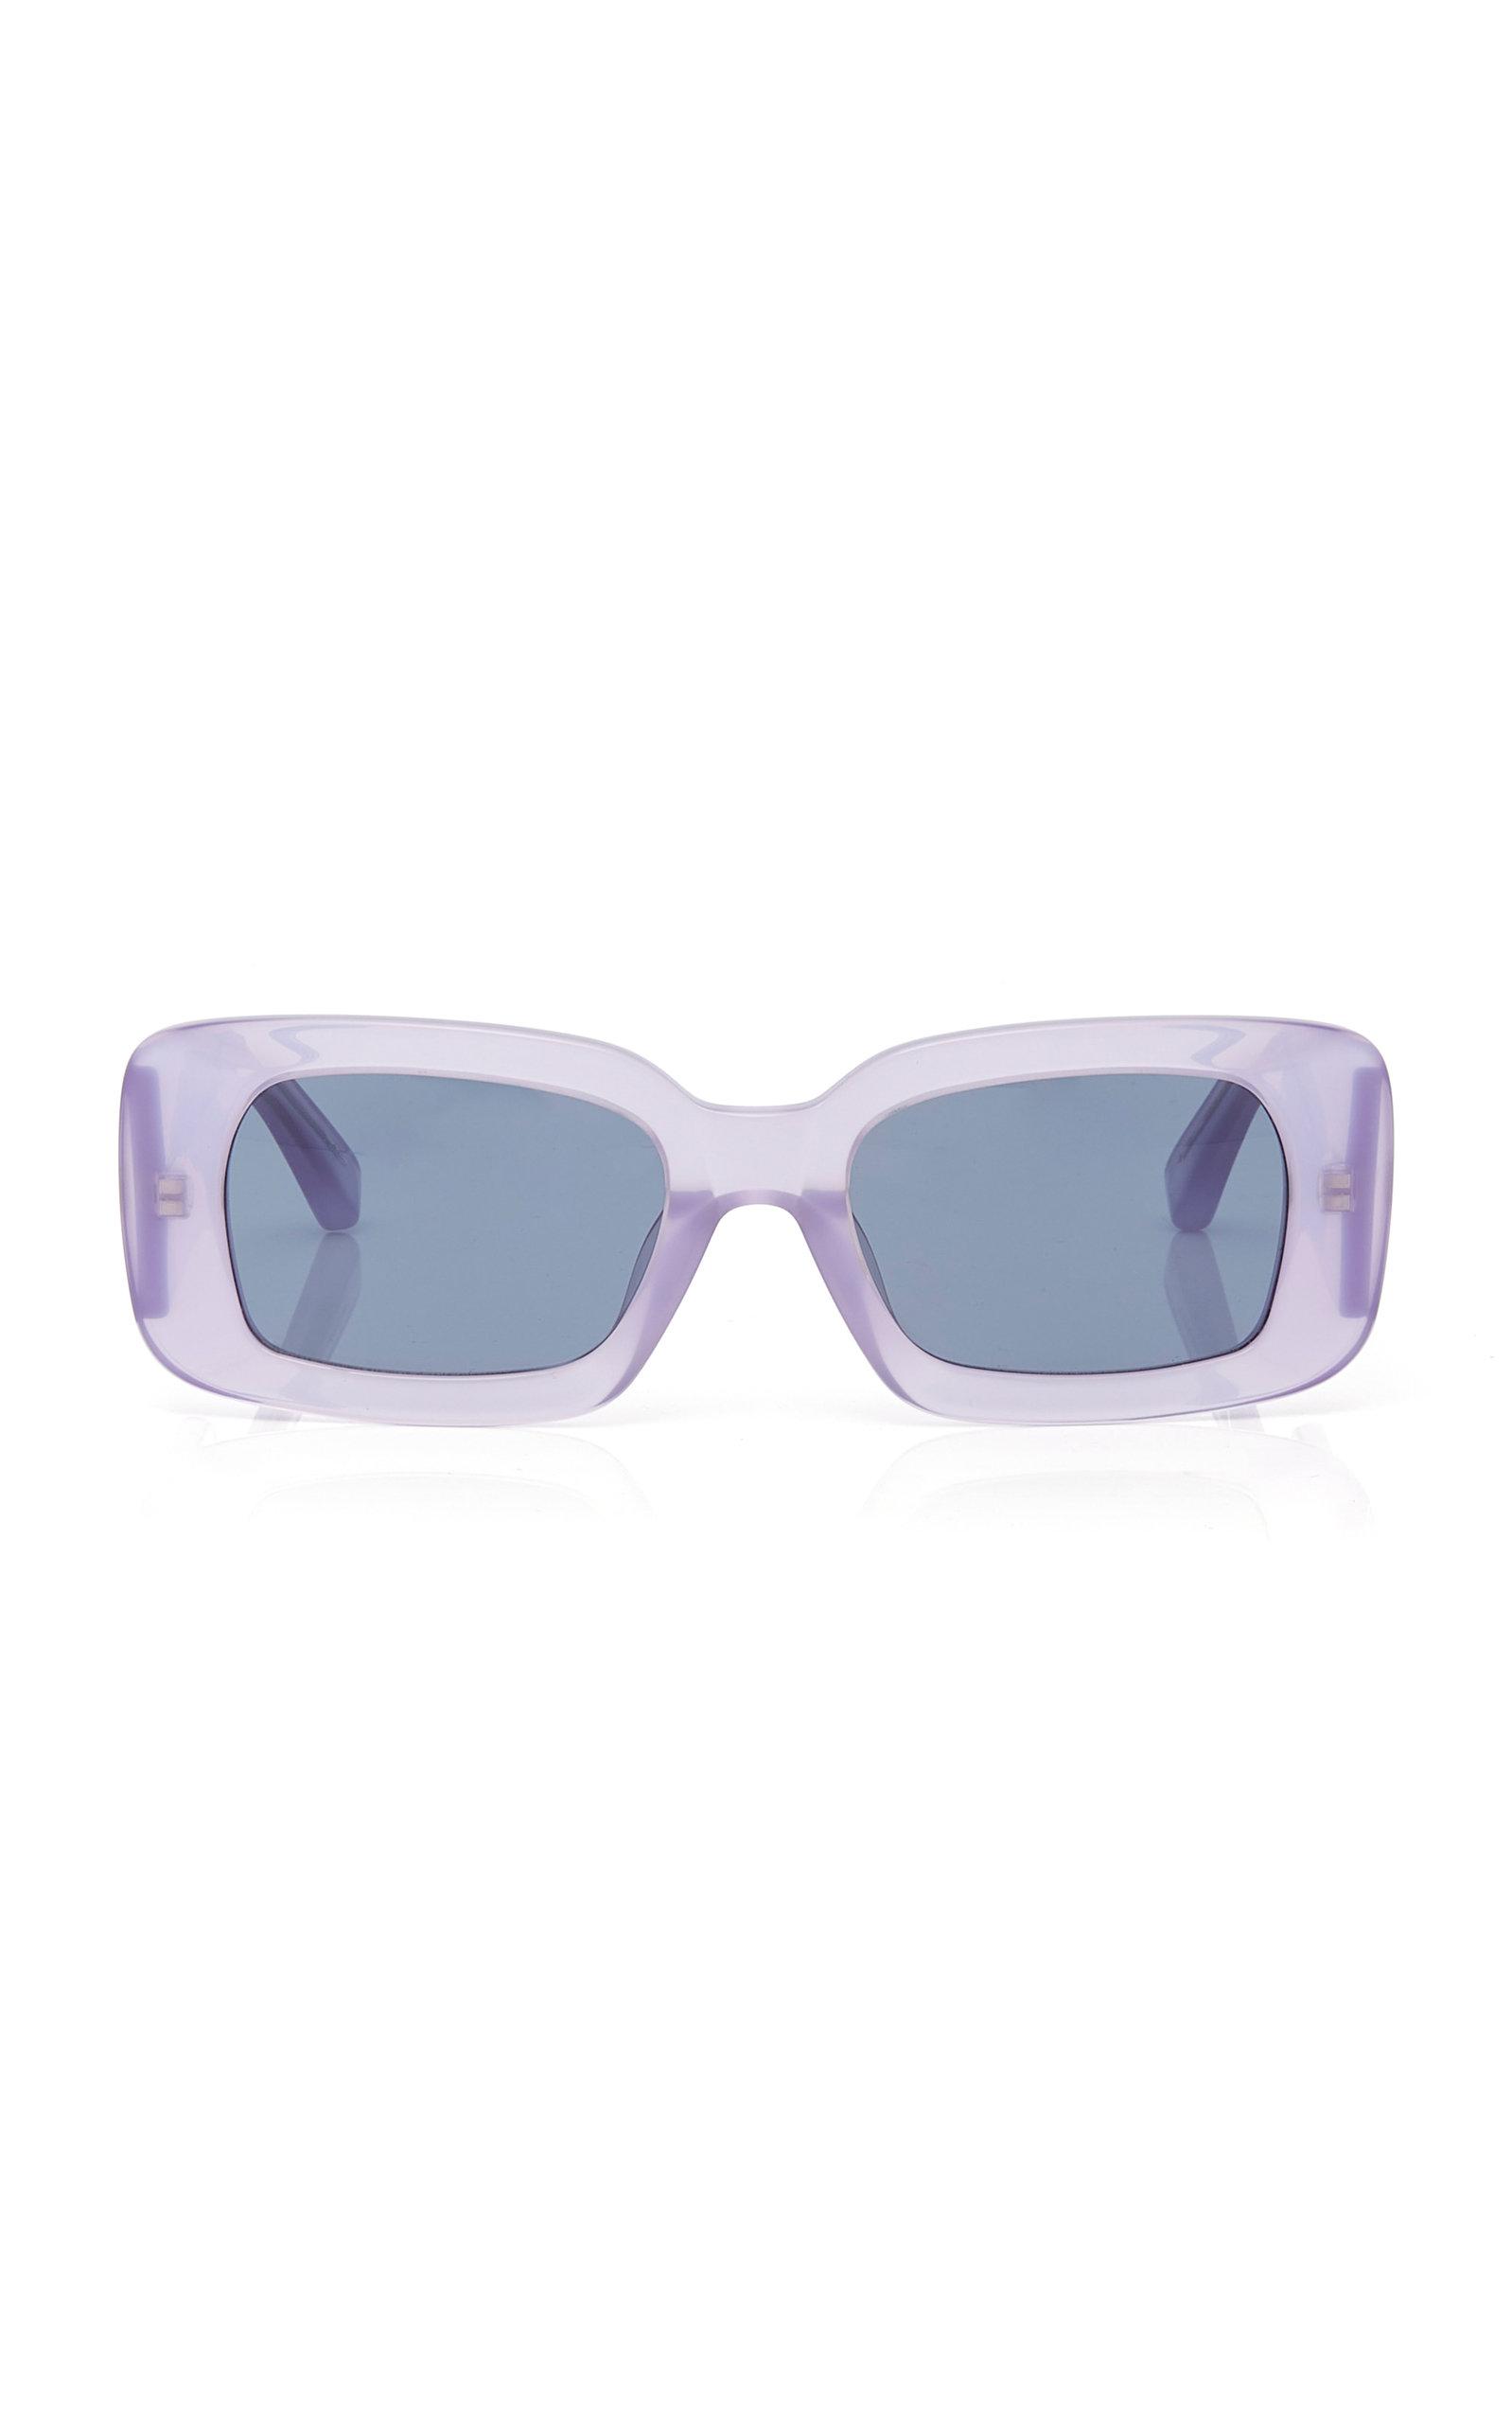 72399be96c3 Dries Van NotenSquare-Frame Acetate Sunglasses. CLOSE. Loading